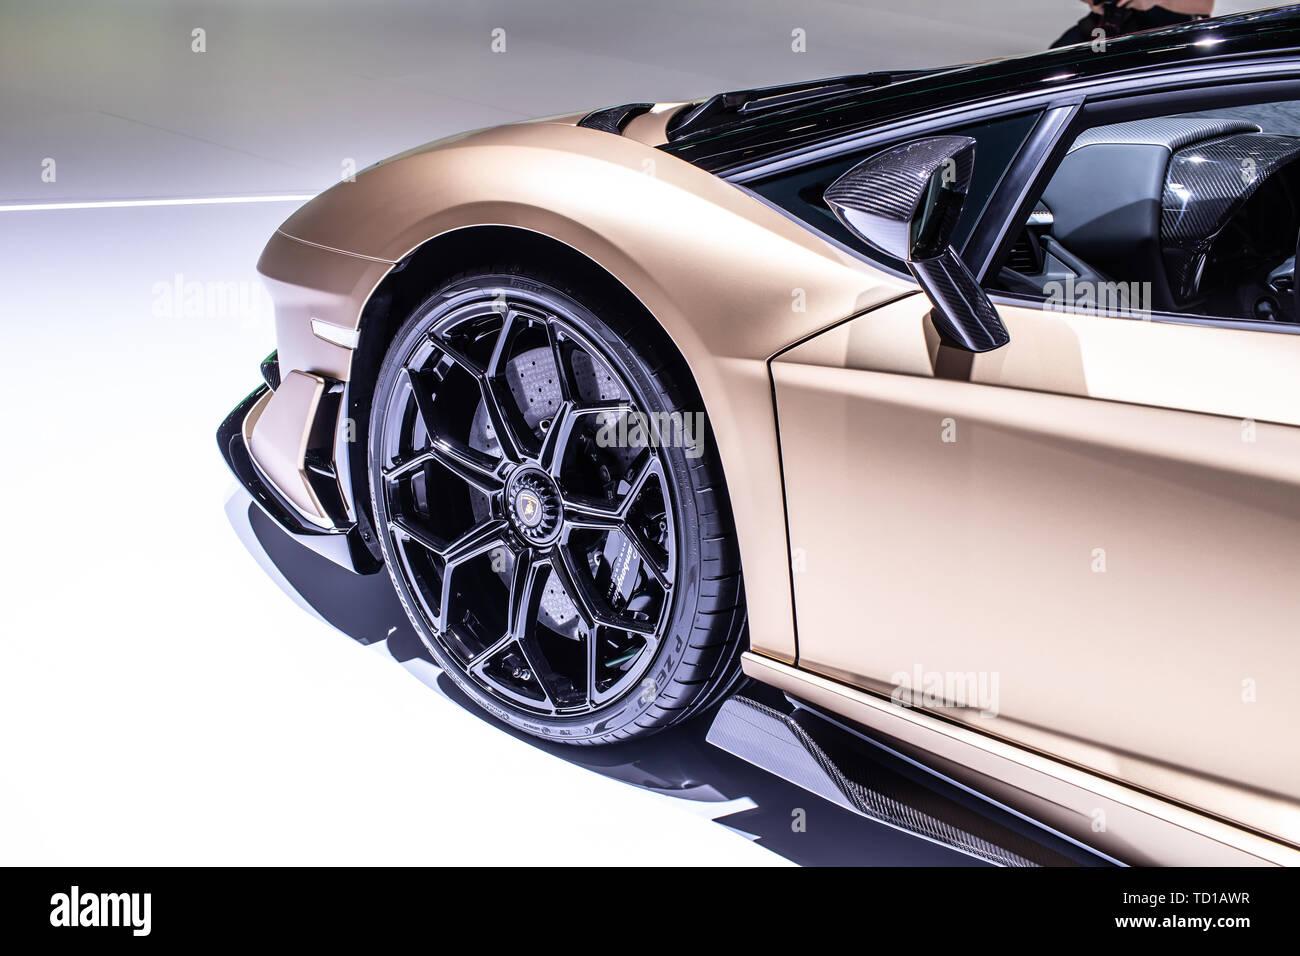 Geneva, Switzerland, March 06, 2019 Lamborghini Aventador SVJ Roadster at Geneva International Motor Show supercar manufactured by Italian Lamborghini - Stock Image